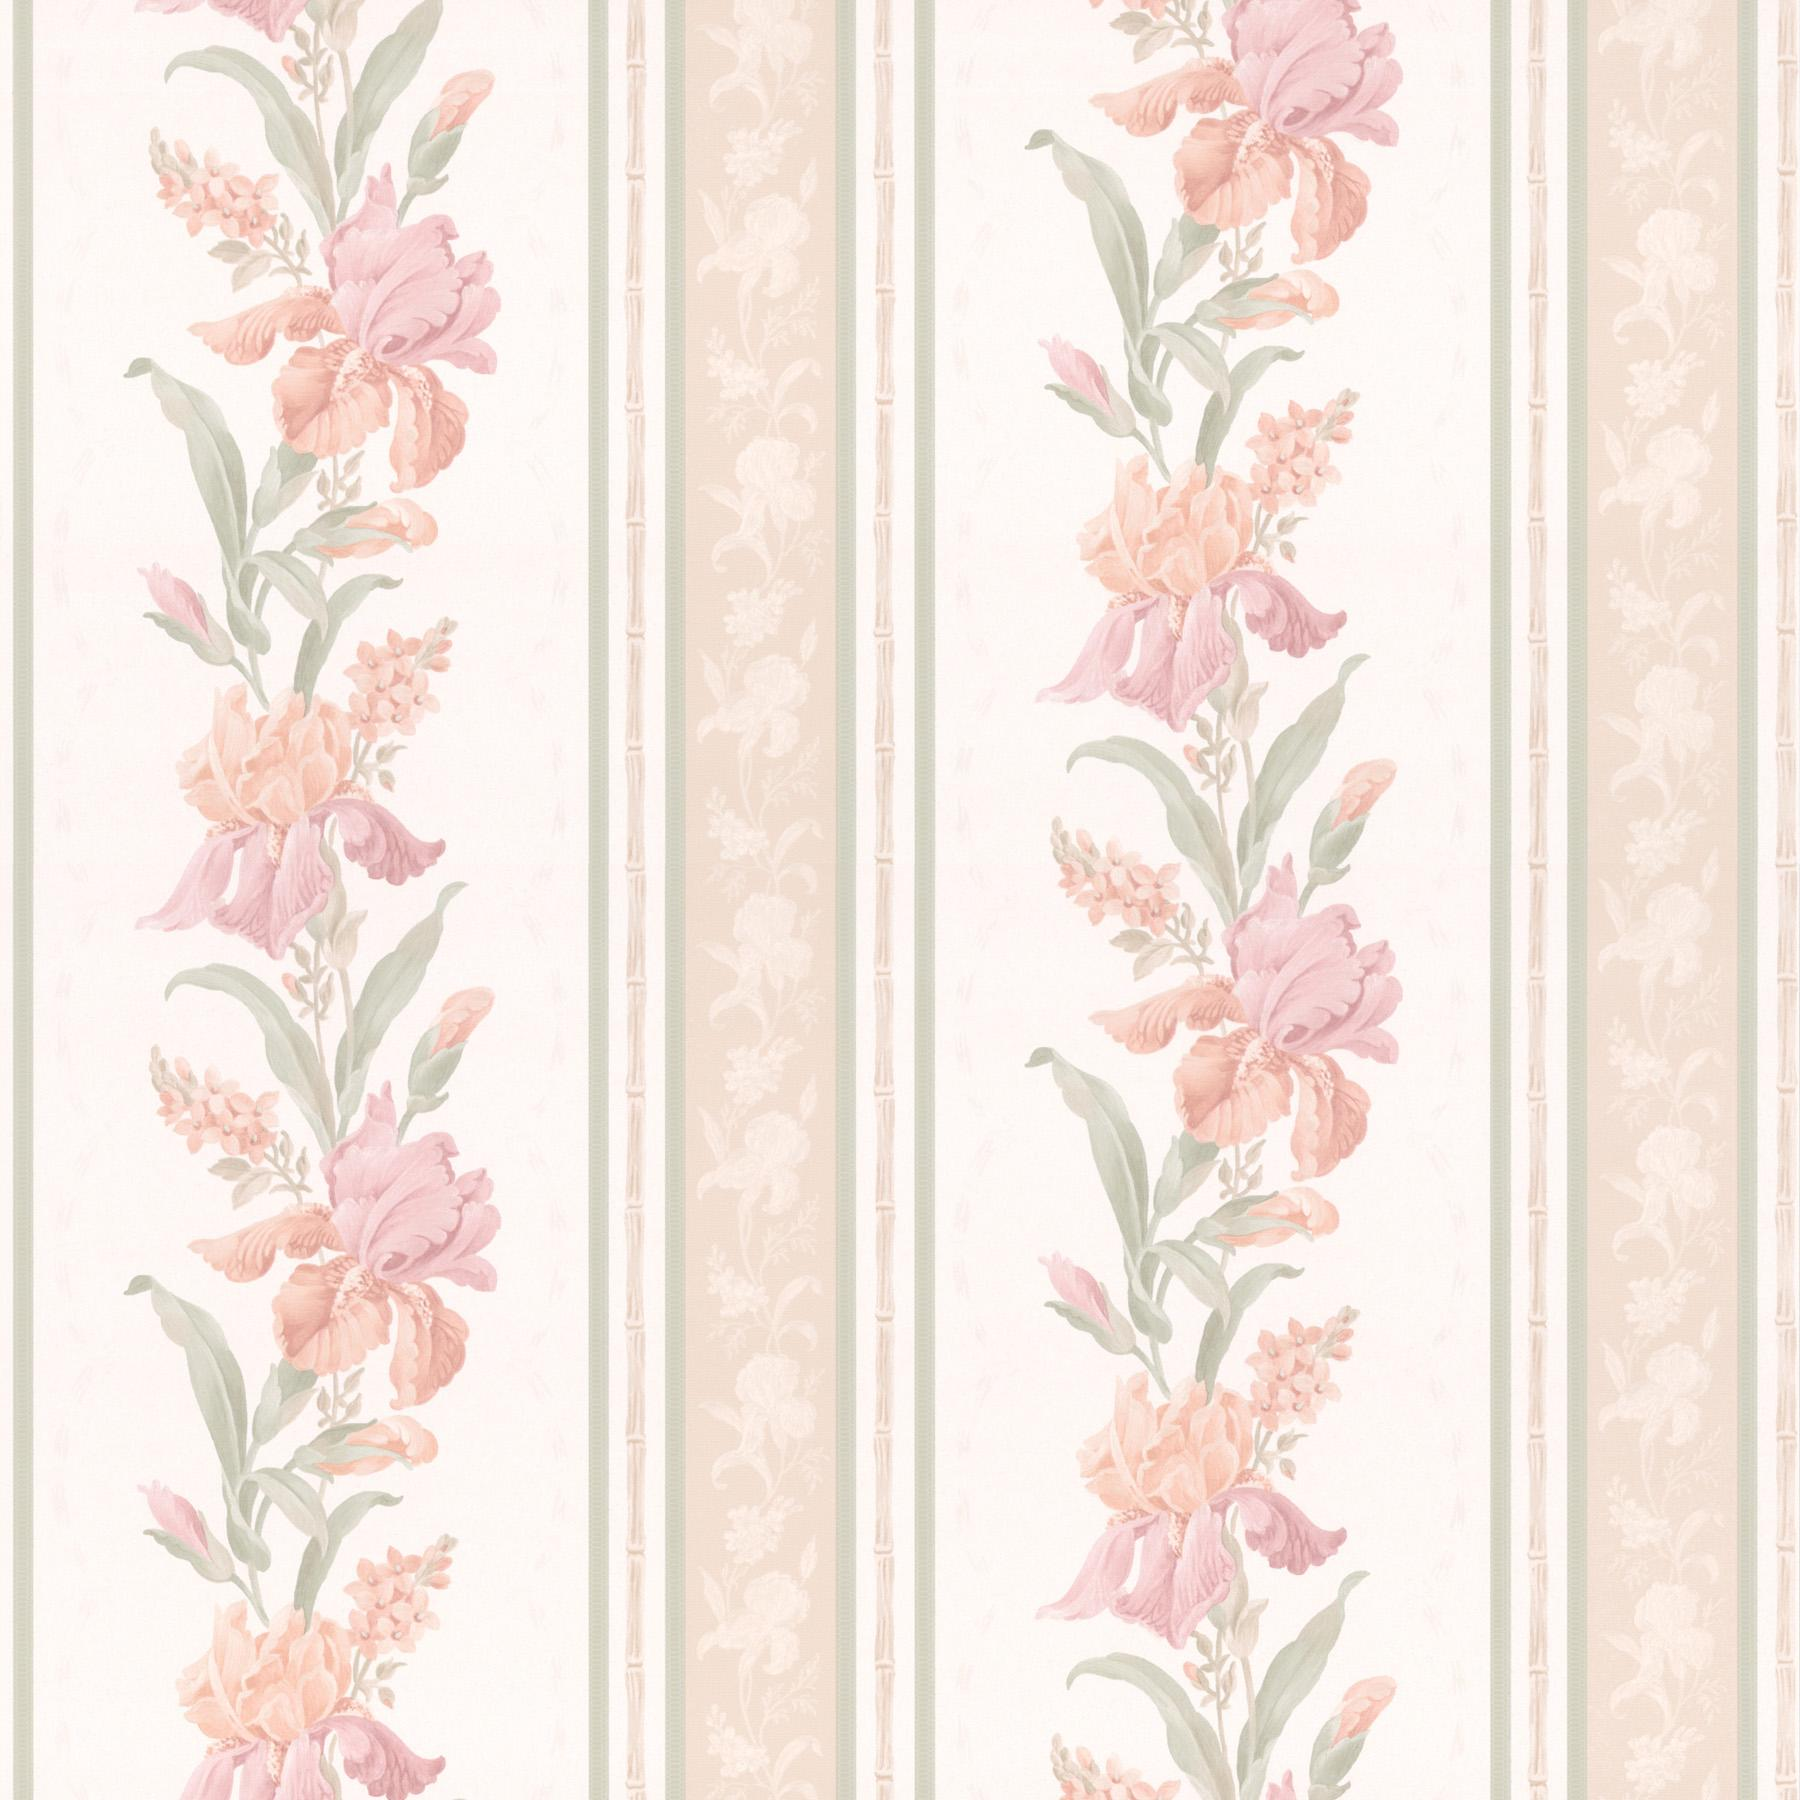 Brewster Wallcovering Peach Floral Stripe Wallpaper Wallpaper